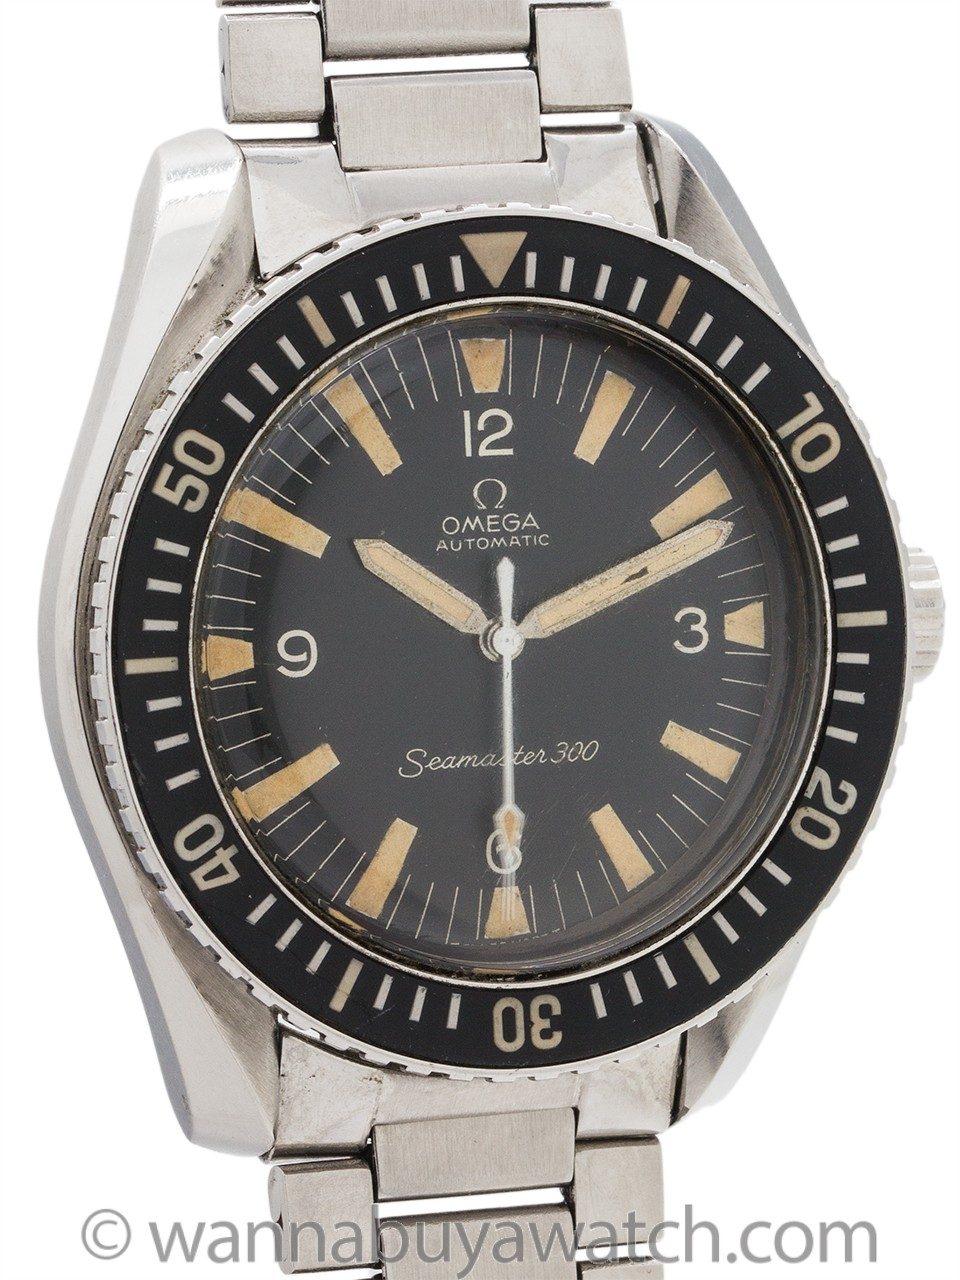 Omega Seamaster 300 ref 165.024 circa 1966 Exceptional!